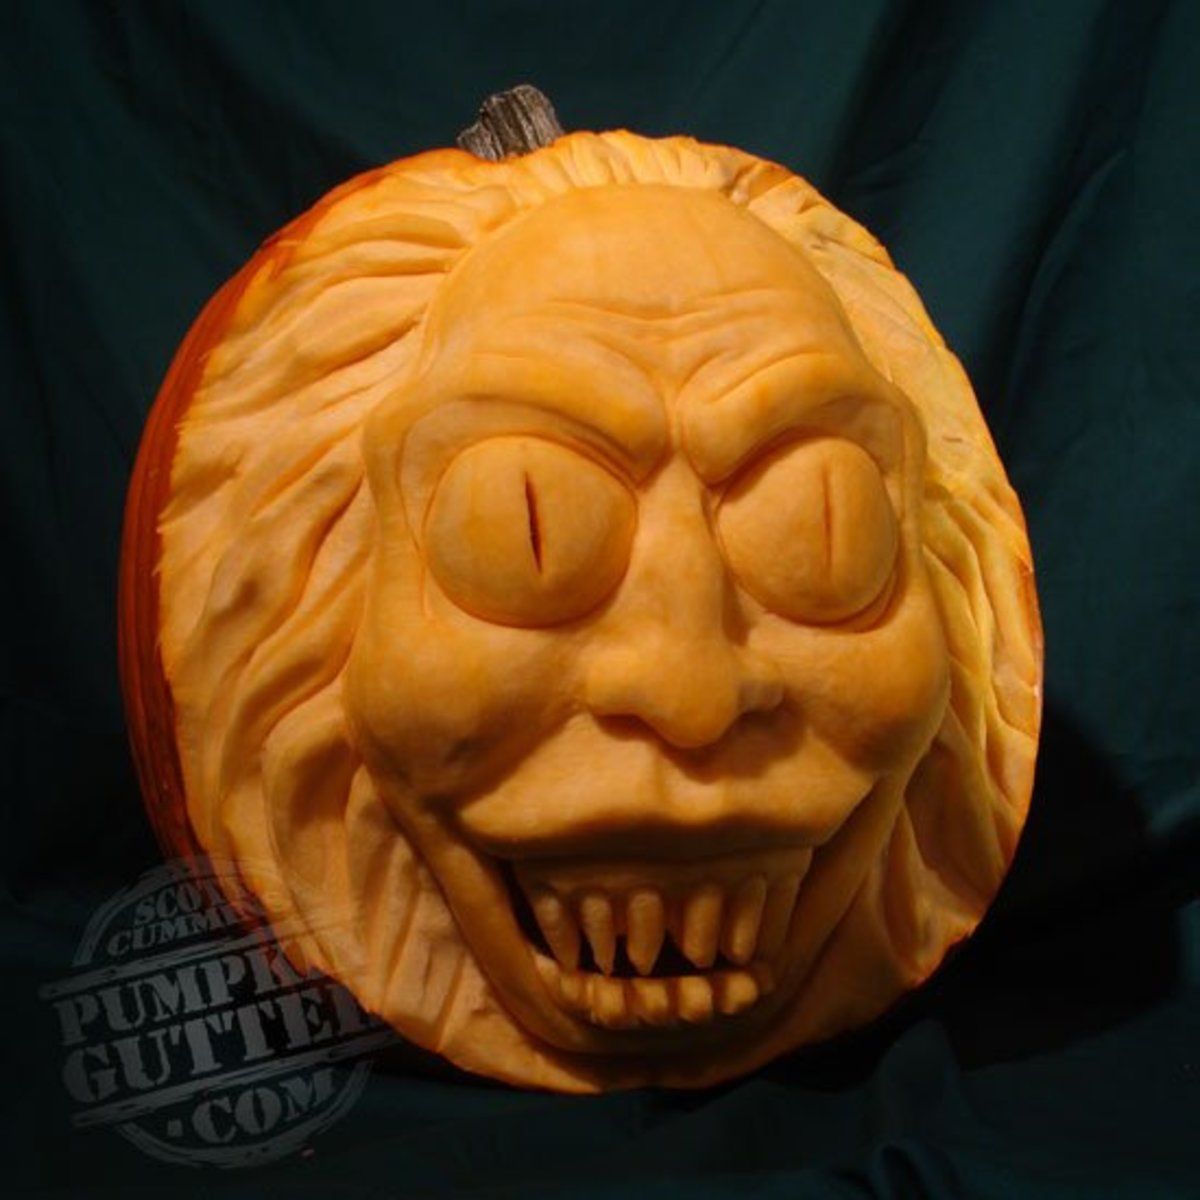 Photos of Amazing, Unique Pumpkin Carving Designs